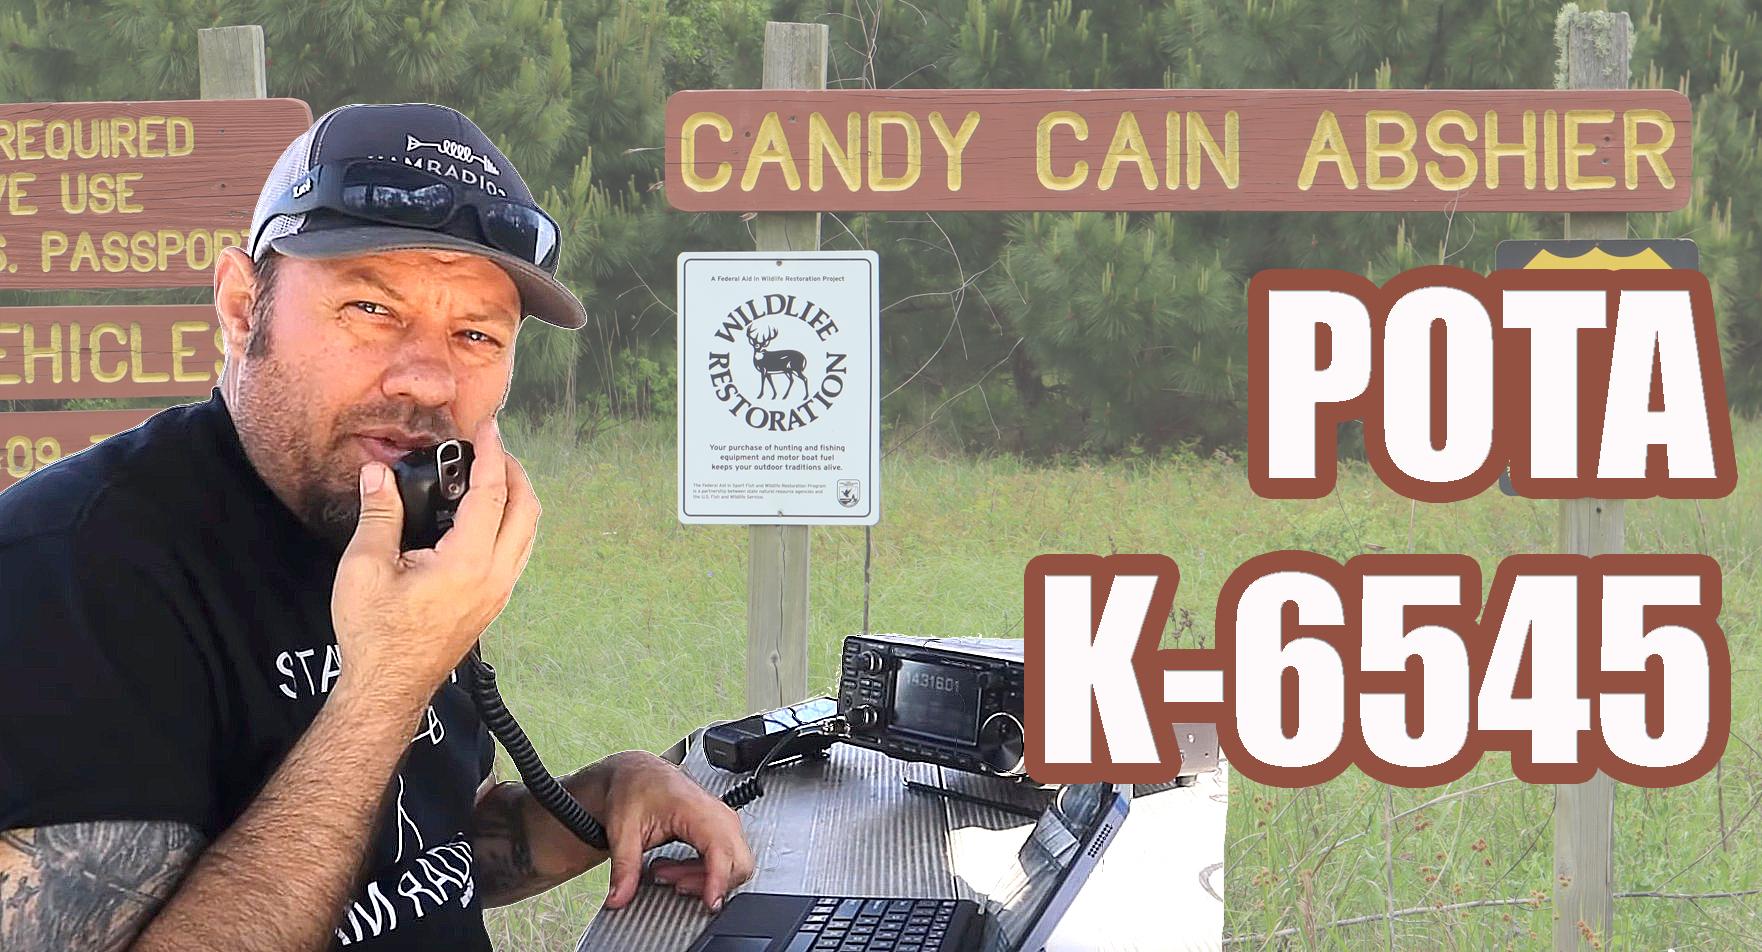 Episode 389: Parks On The Air Activation K-6545 | Ham Radio POTA